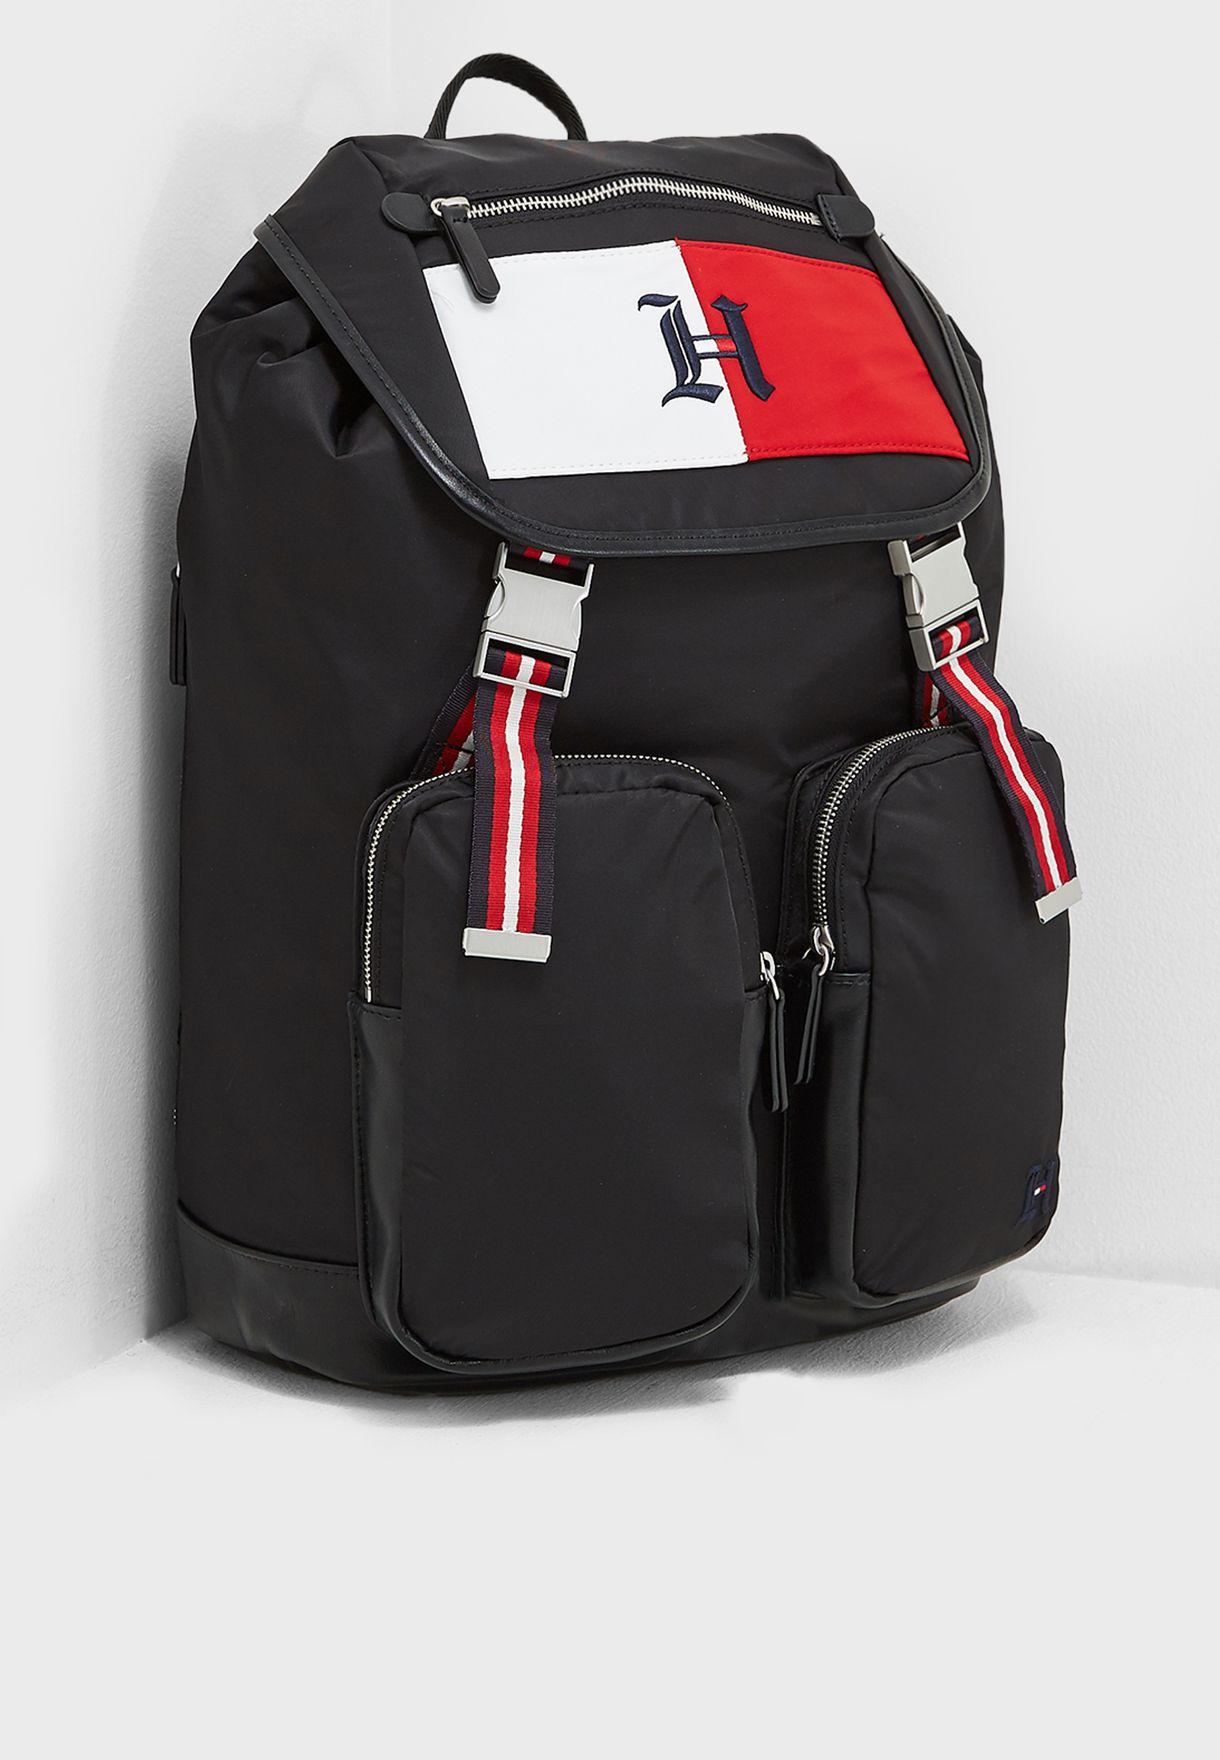 44e93056 Shop Tommy Hilfiger black Lewis Hamilton Backpack AM0AM04140002 for ...